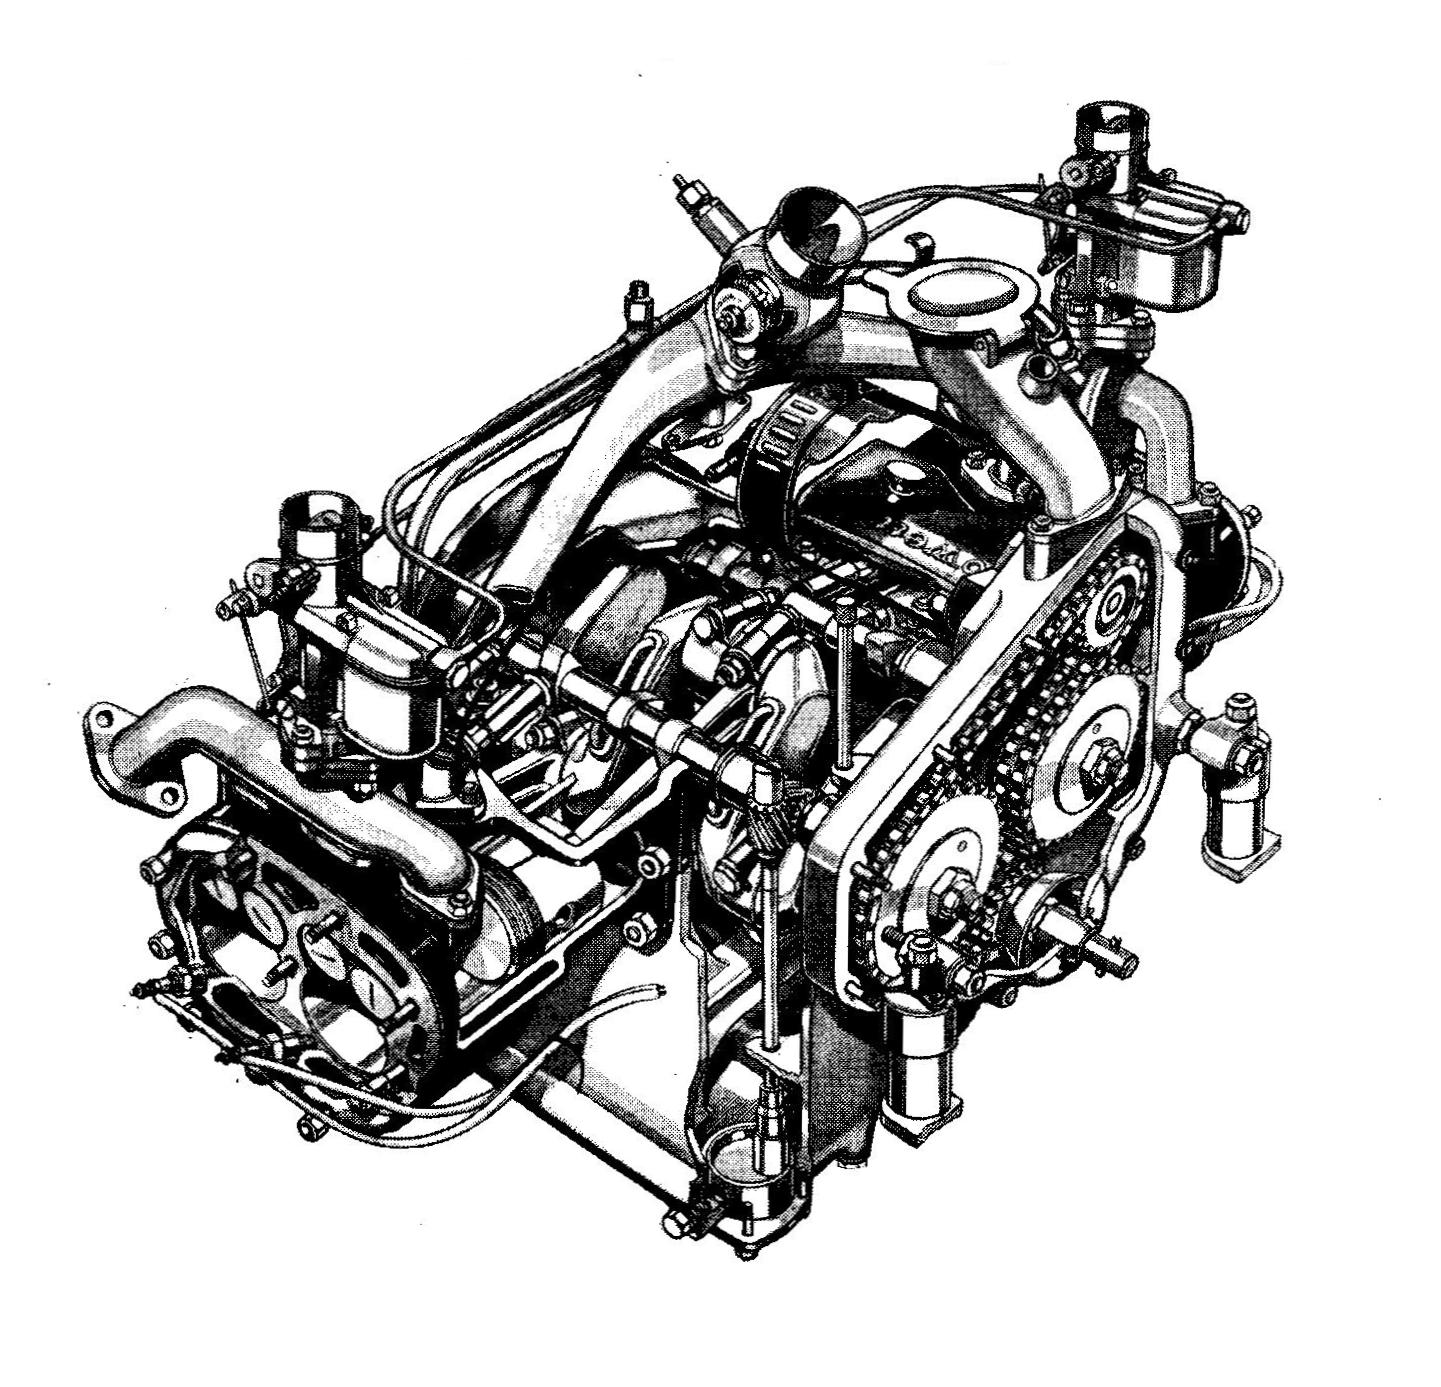 Flat Engines